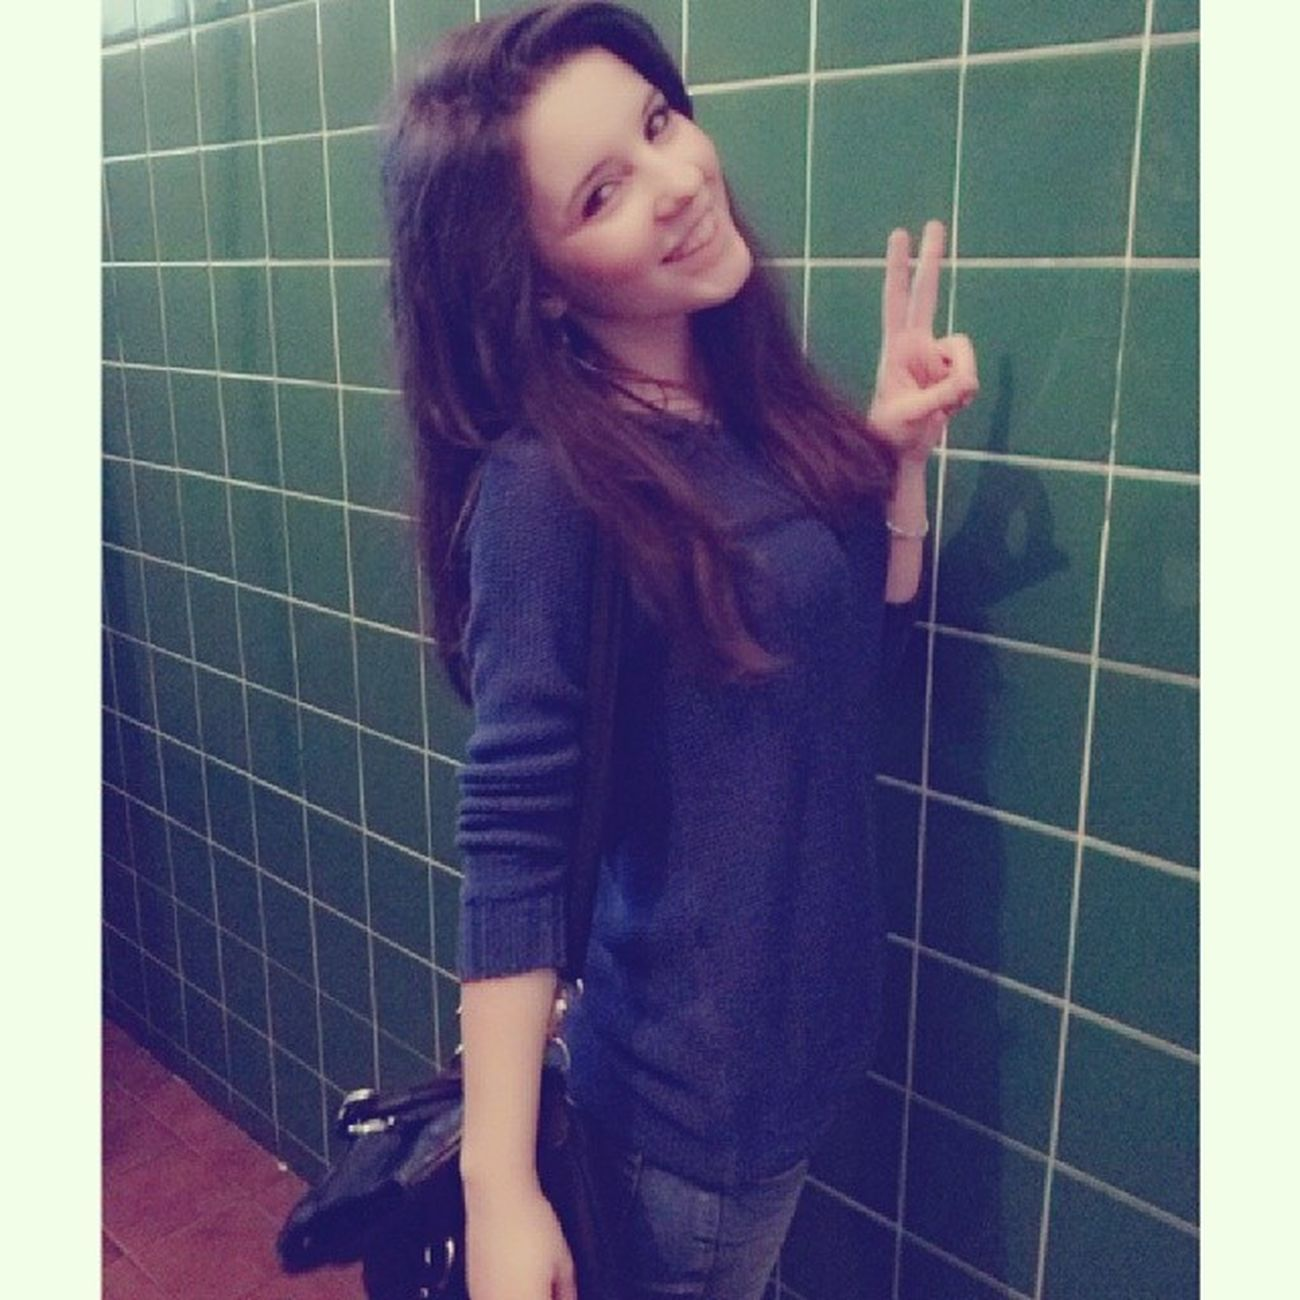 Szkoła School Polishgirl Girl instabeauty instagirl peace nudy po lekcjach cute l4l smile happy @peoplearestupiddd i marta m*********** obok hahahahahaha .